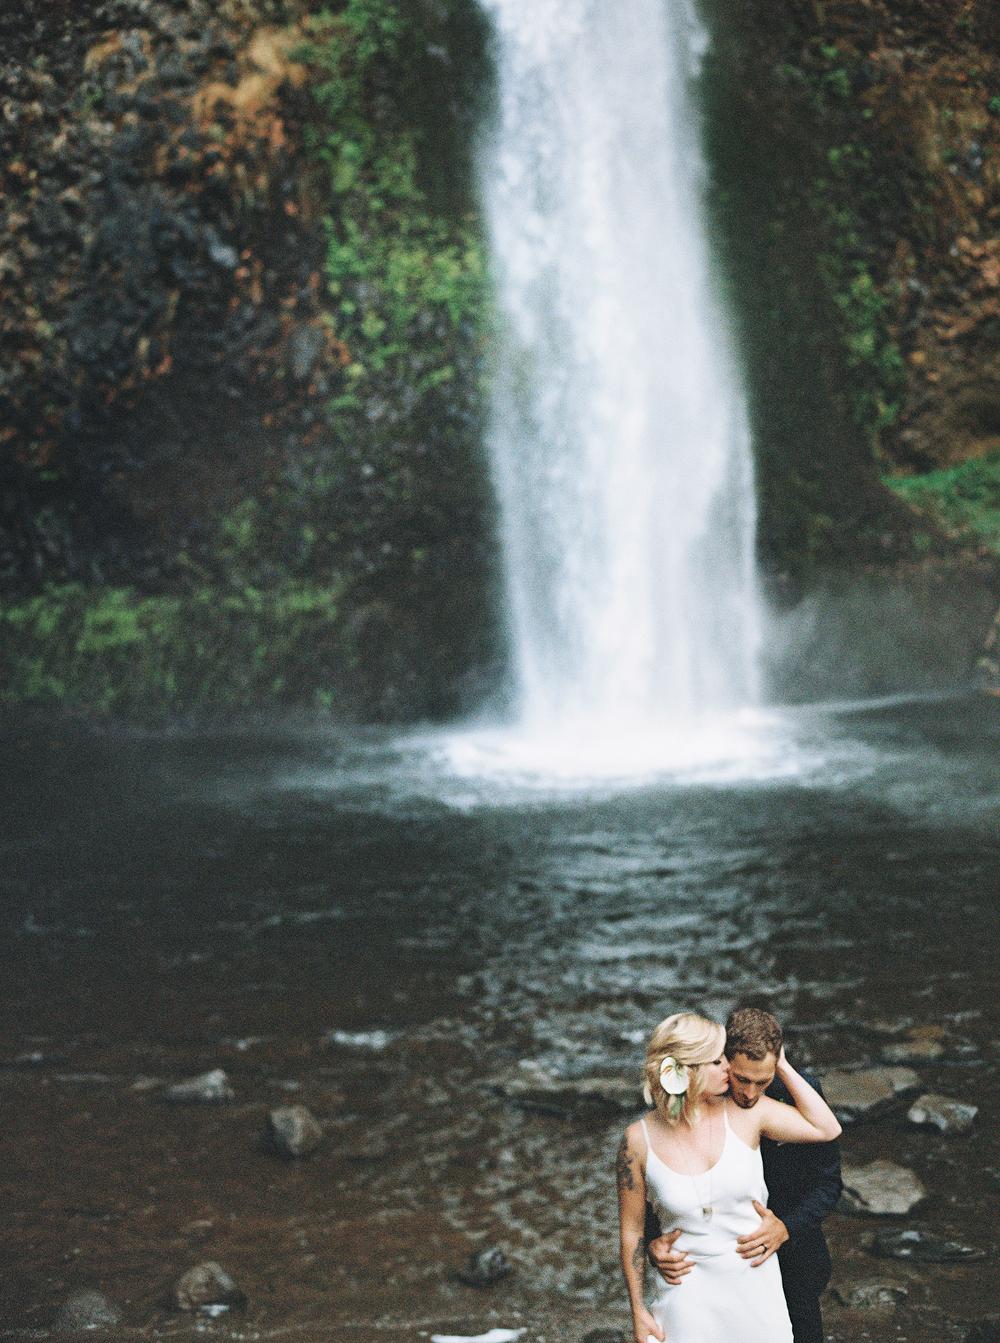 055Outlive+Creative+Tropical+Northwest+Columbia+Gorge+Elopement+Film+Photographer.jpg